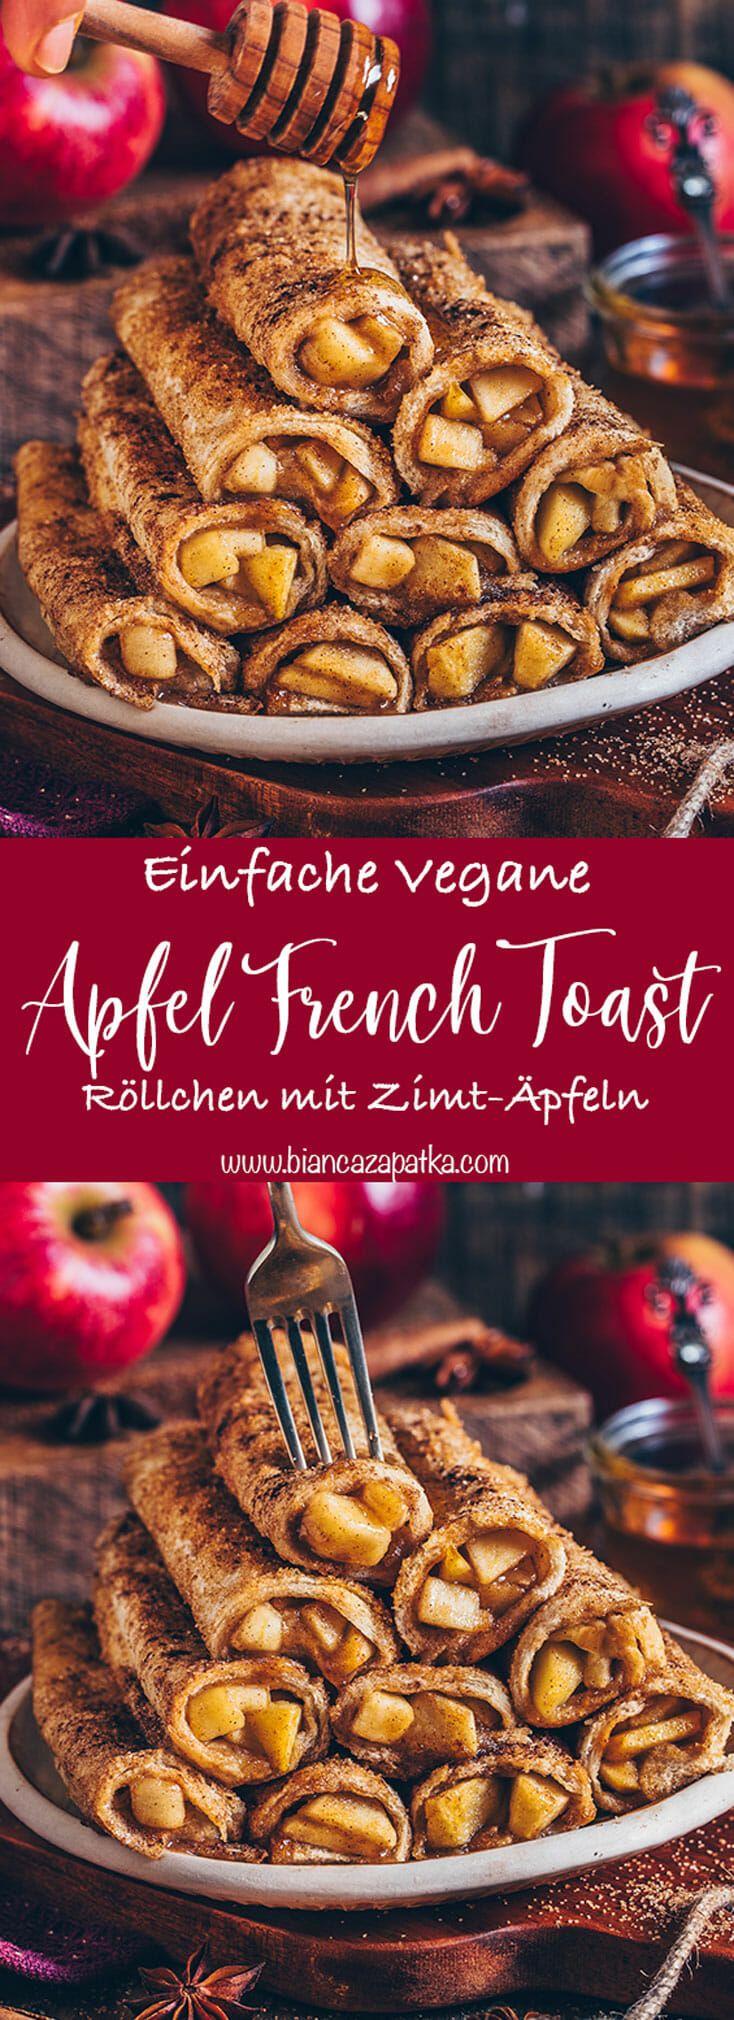 Photo of French Toast Roll-Ups mit Apfel-Zimt-Füllung (vegan) – Bianca Zapatka | Rezepte